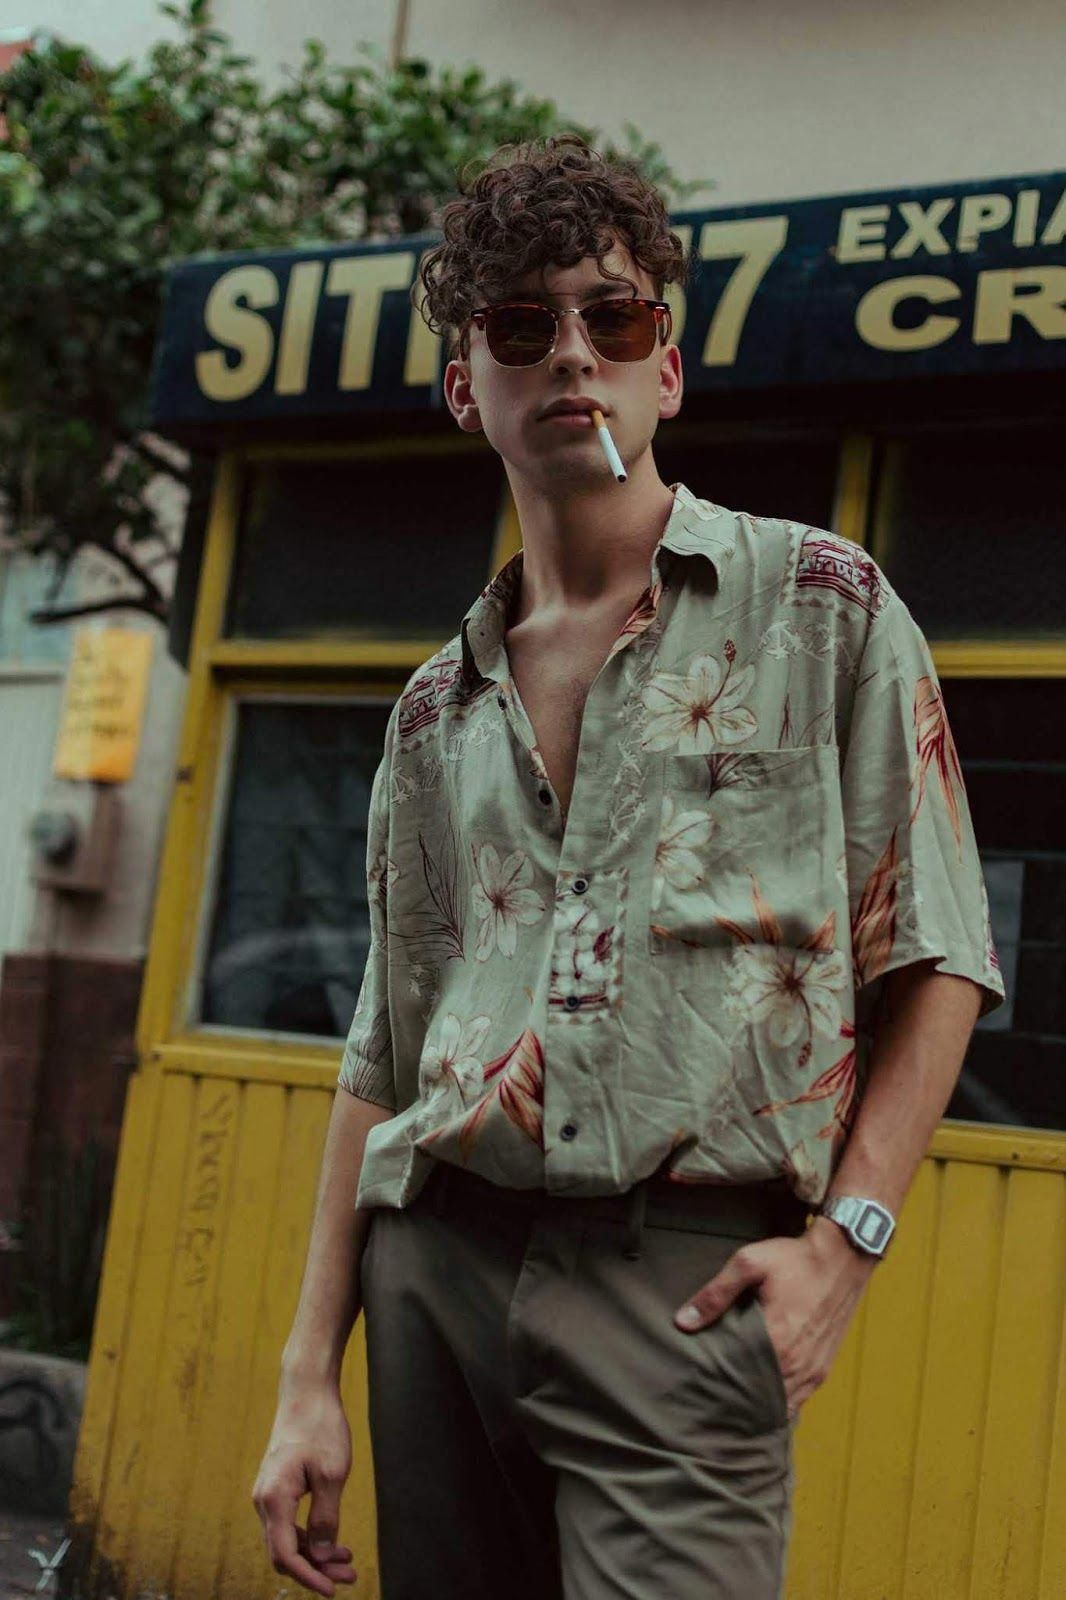 I Love This Urbanmensfashion 80s Fashion Men Retro Fashion Photography 90s Fashion Men